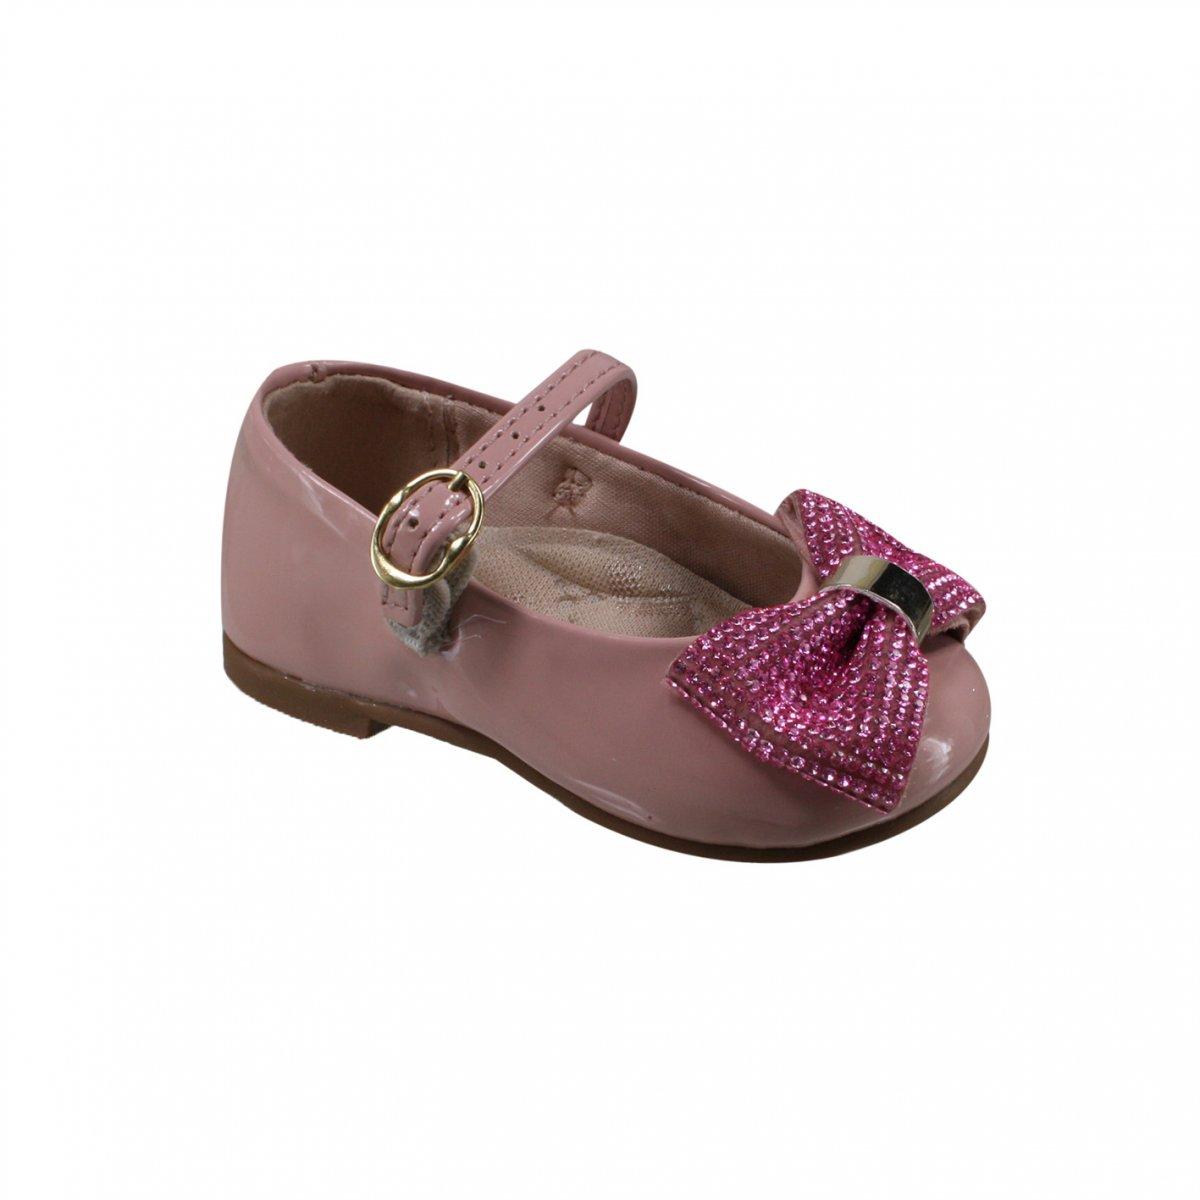 386973585 Sapatilha Infantil Molekinha Bebê 2106.171 13488 53252 Rosa (Verniz Premium)